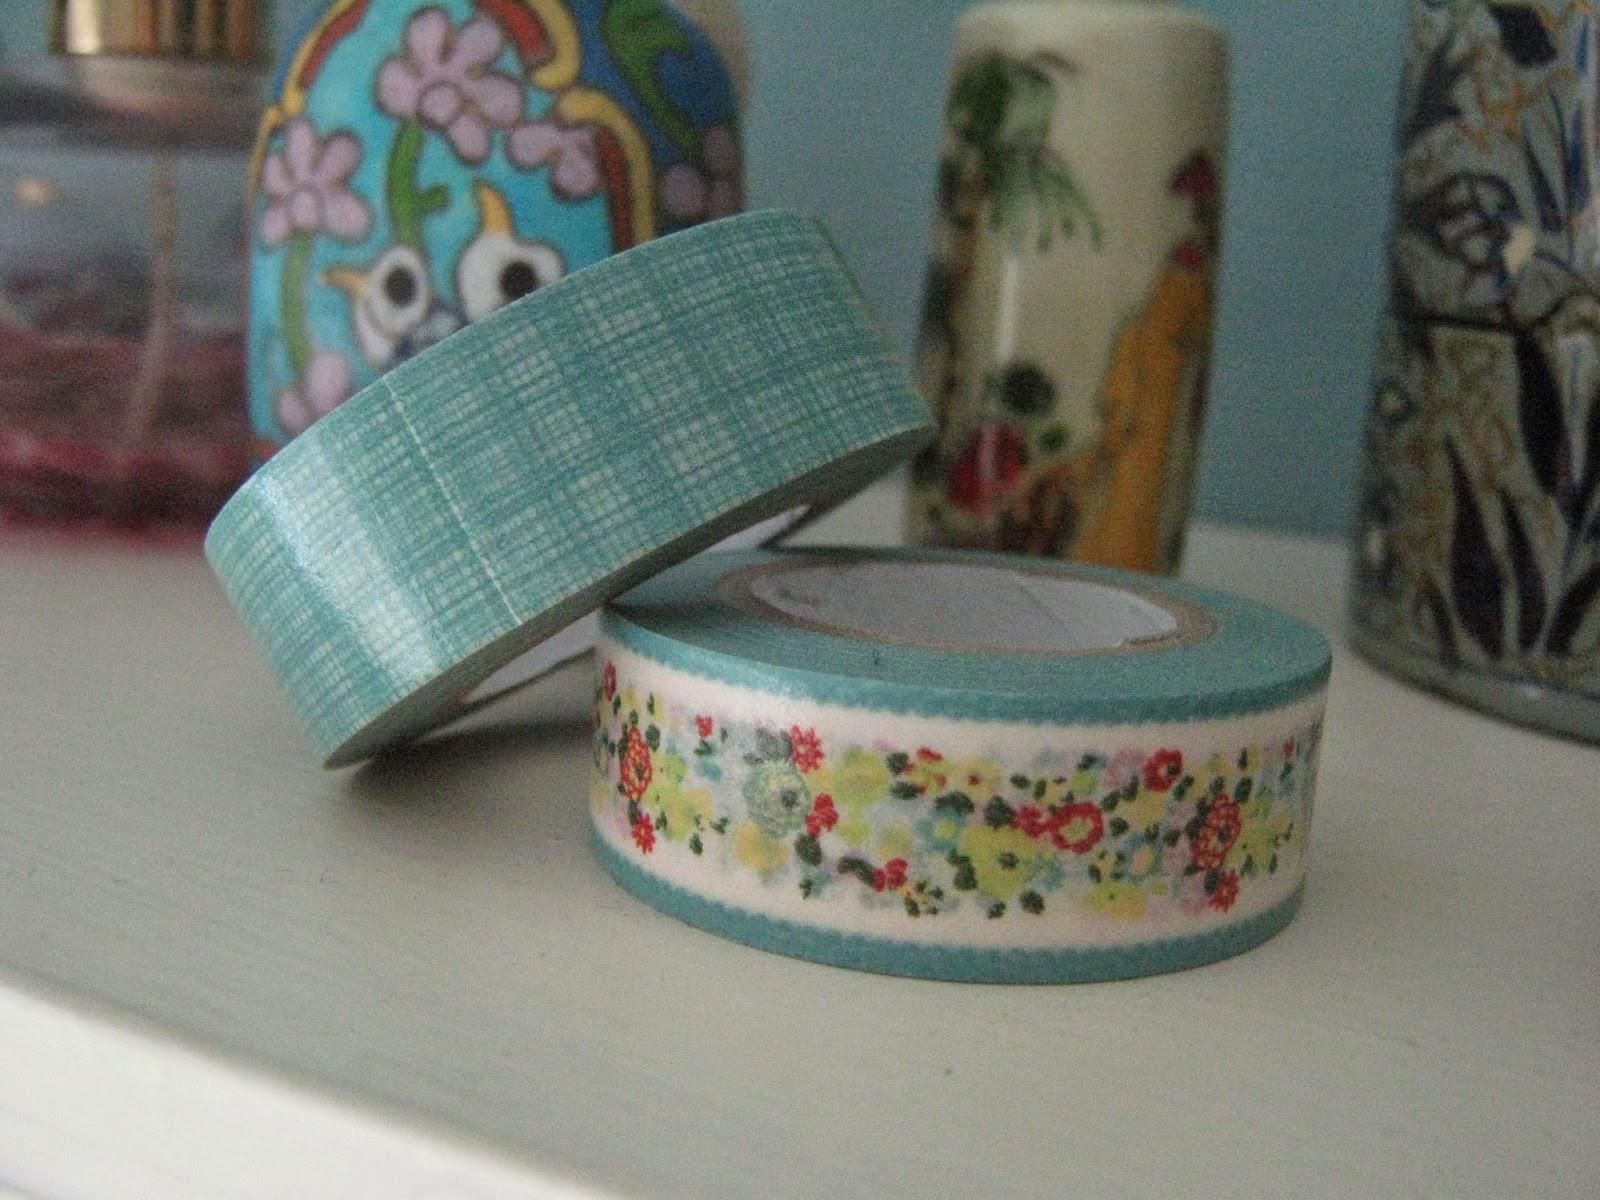 Wilkos Floral Washi Tape